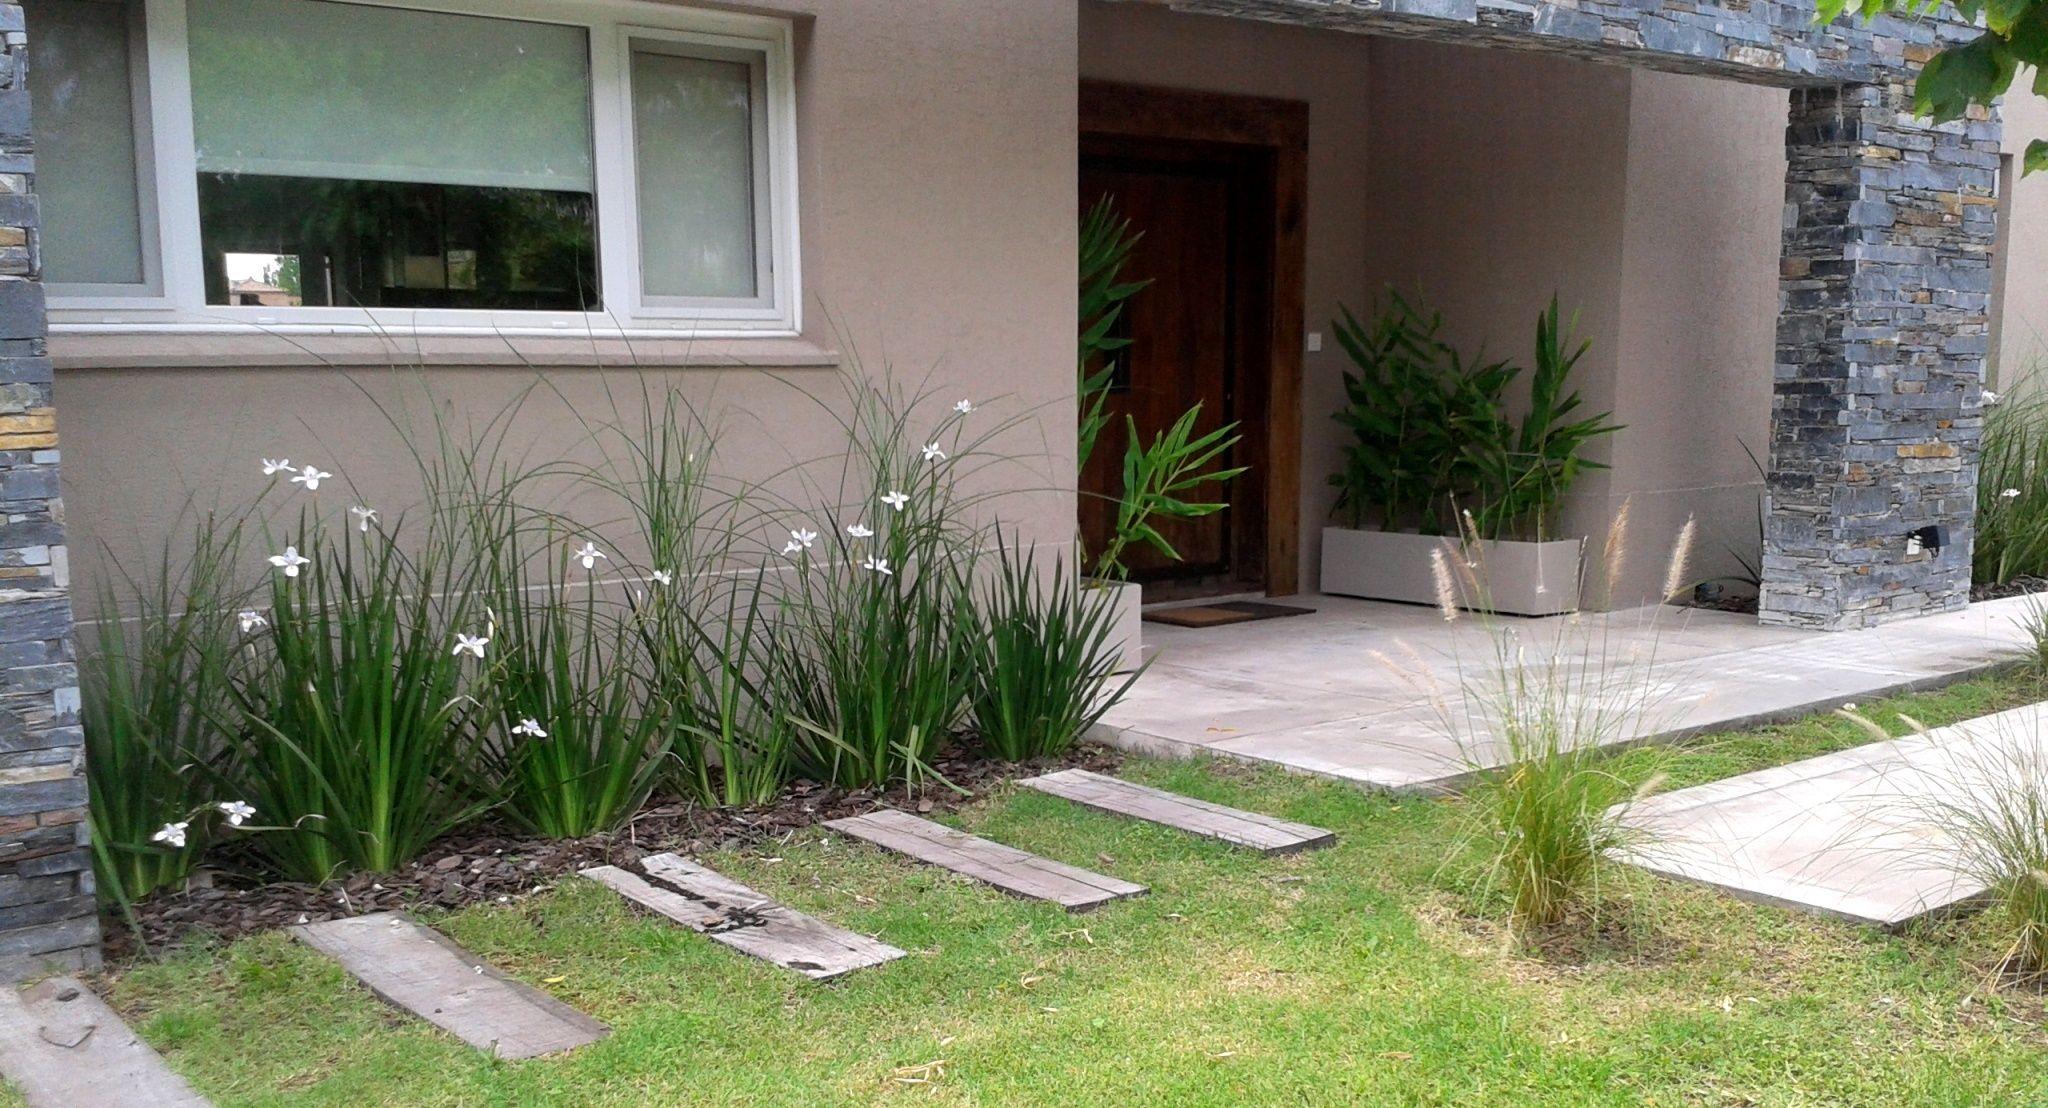 Dietes penisetum miscanthus ca a de ambar mbf for Casa moderna jardines